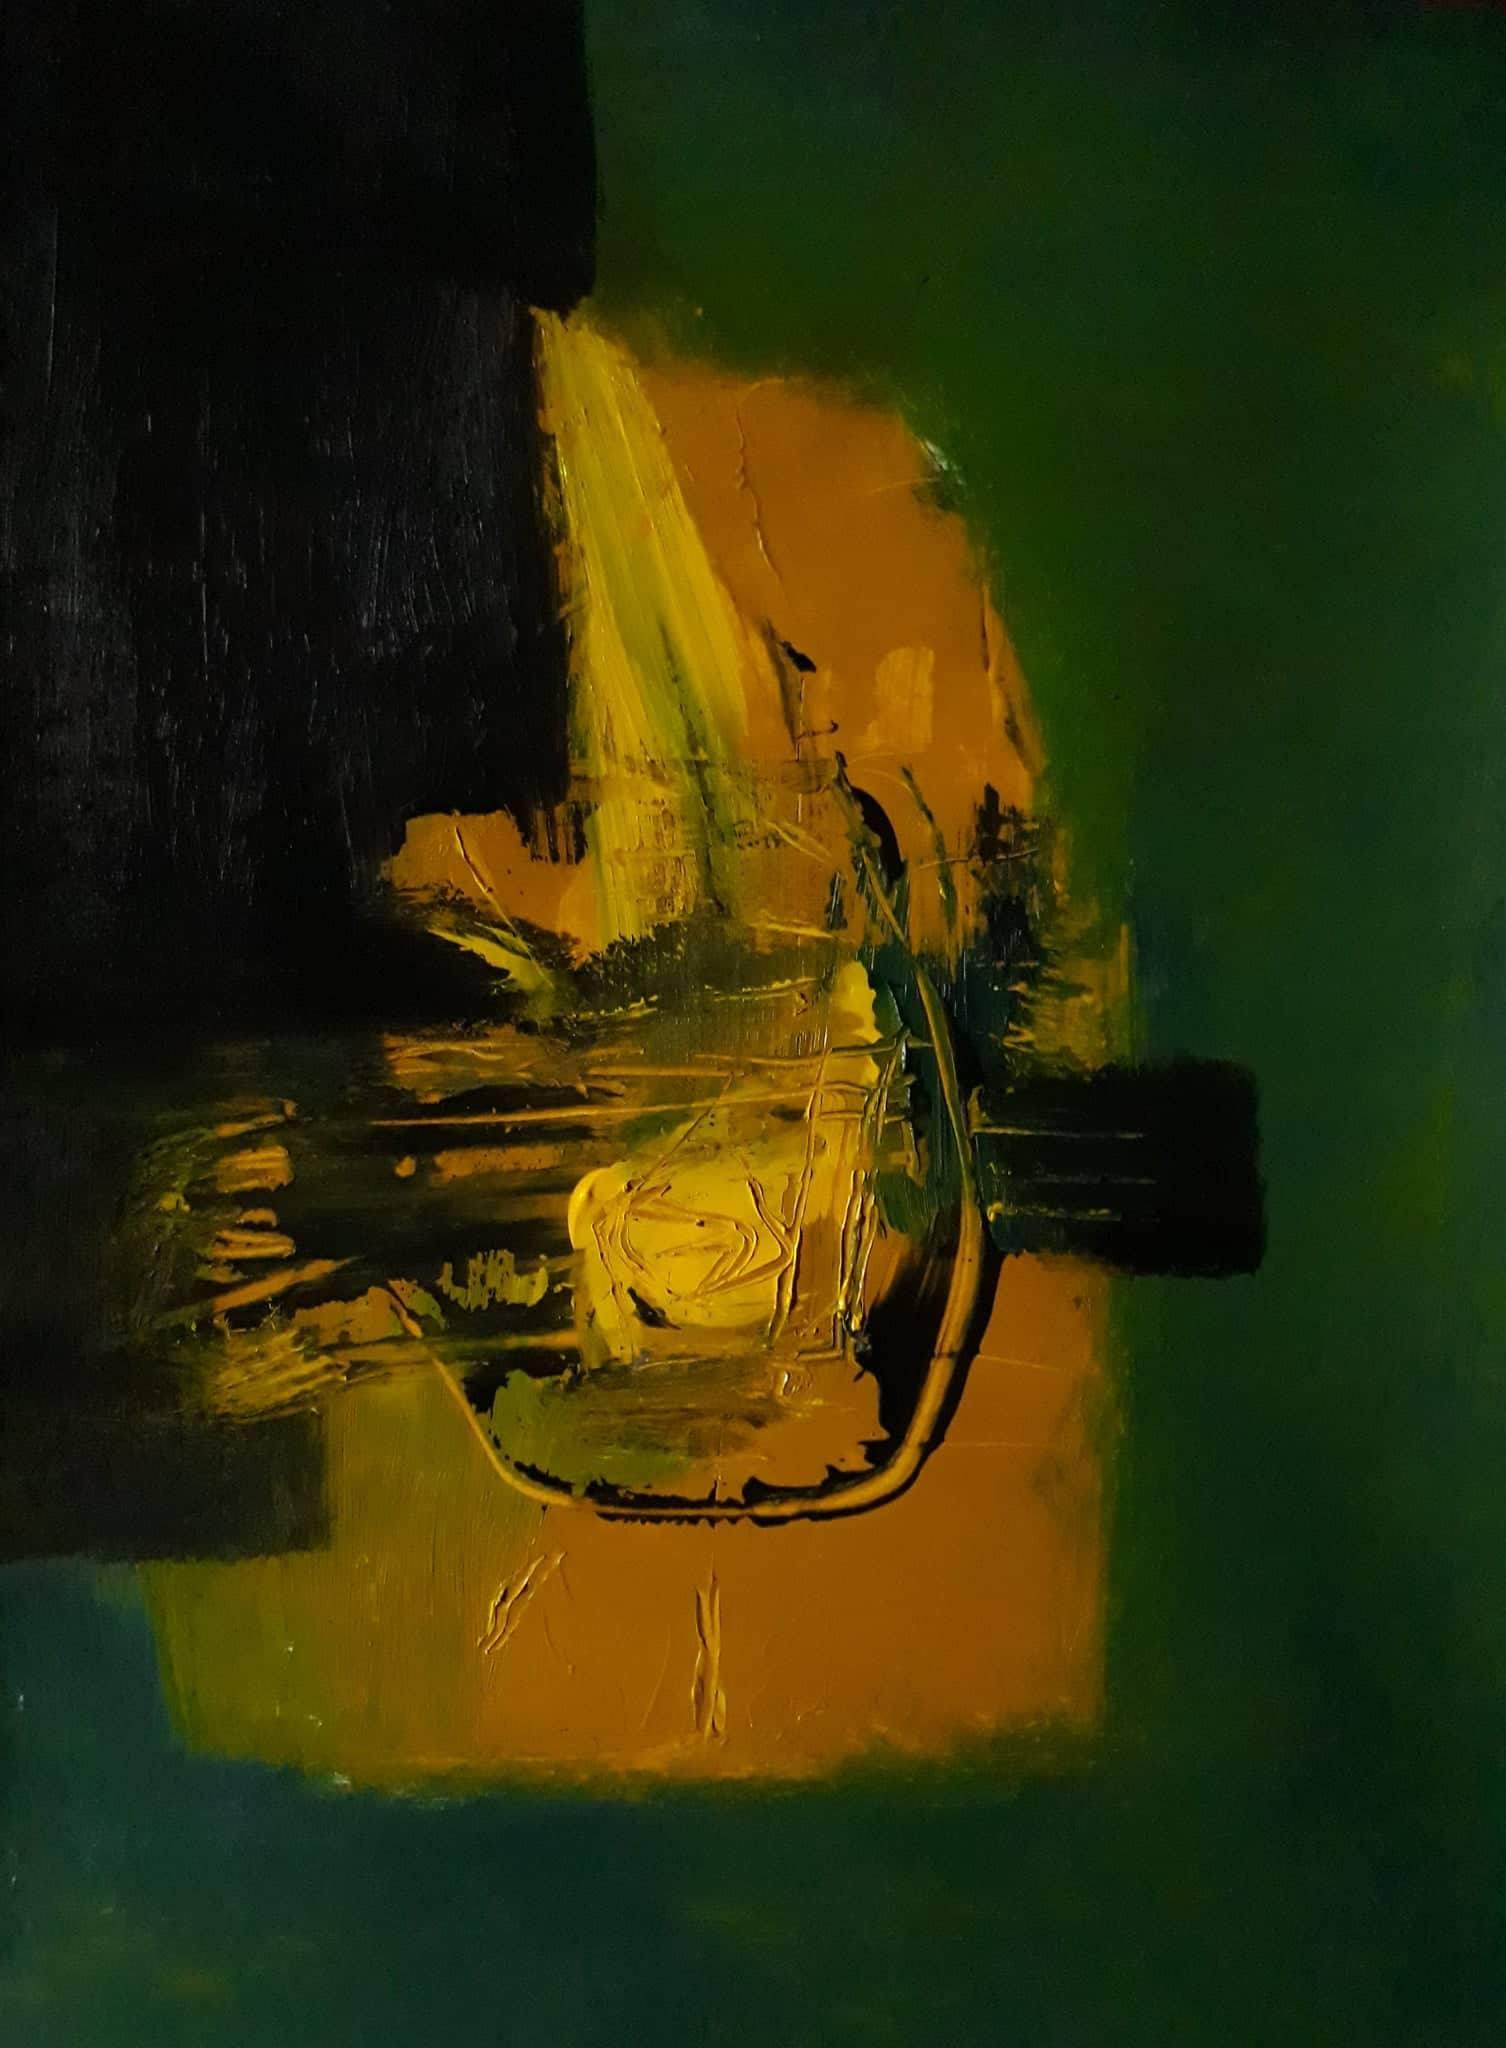 Birth of Poetry, dipinto di Somnath Basuthakur